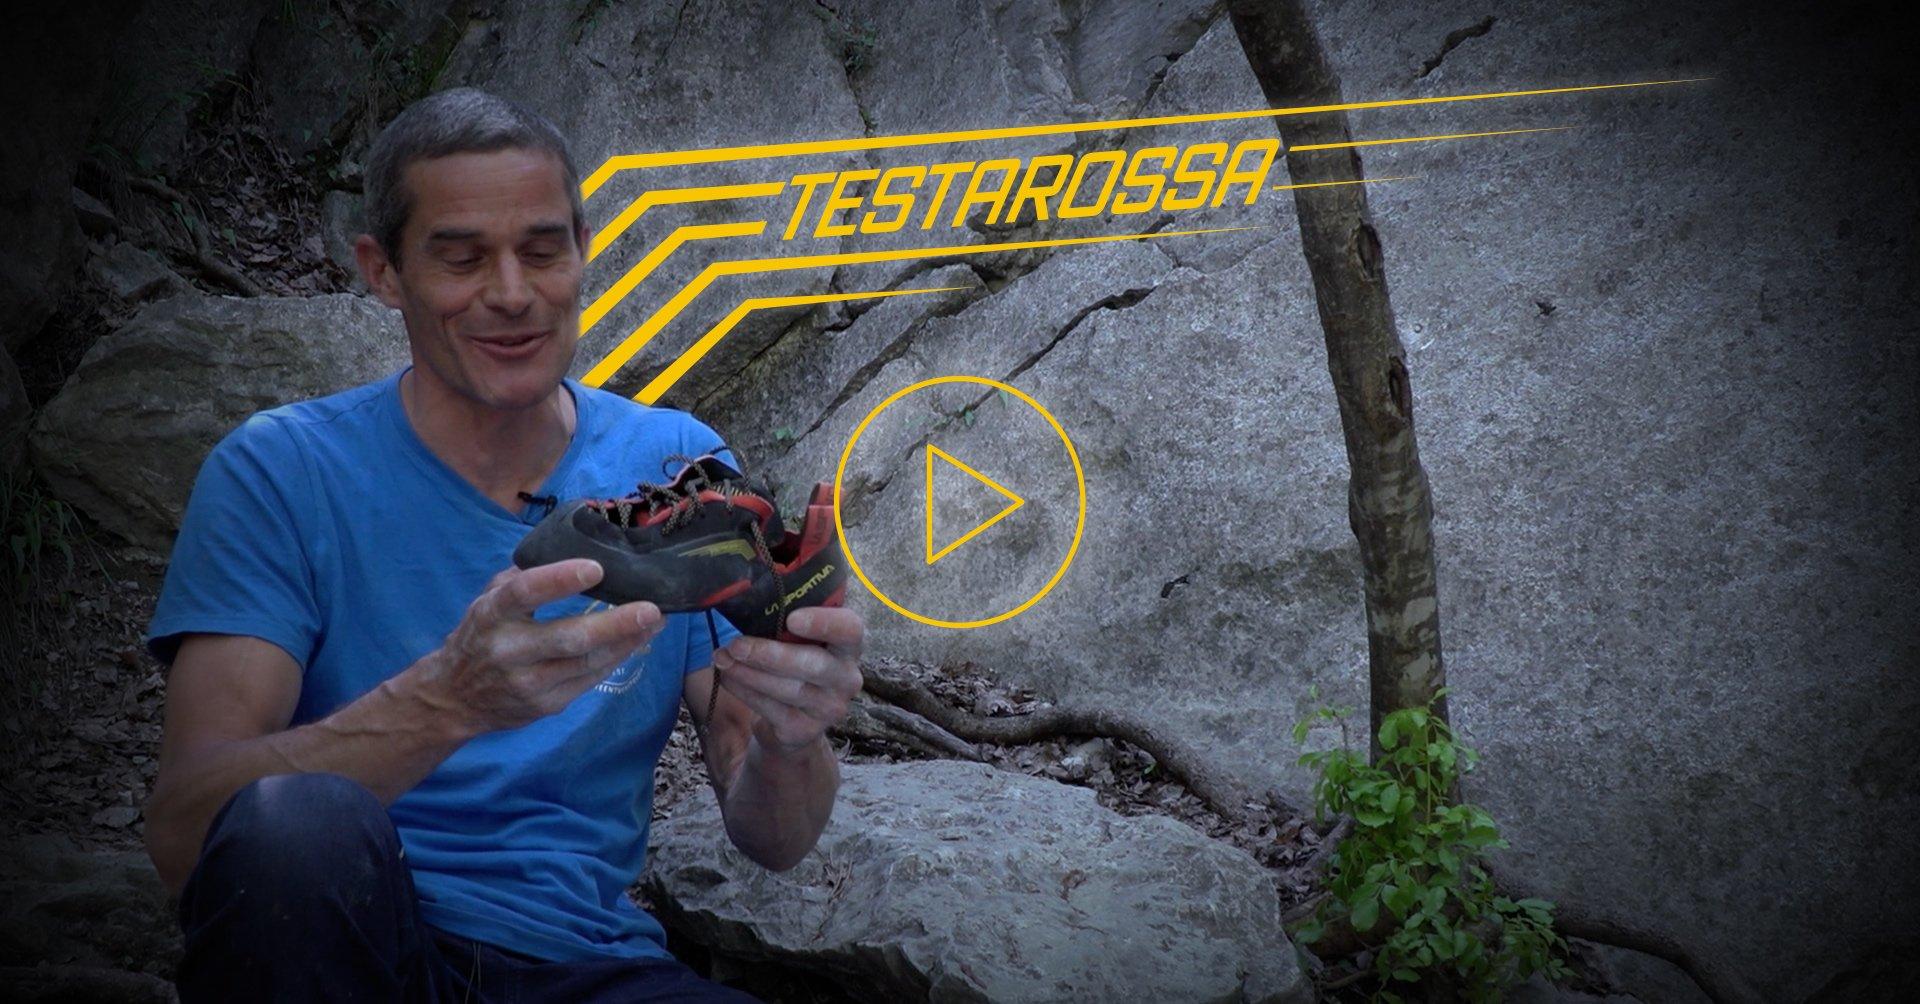 Testarossa_video